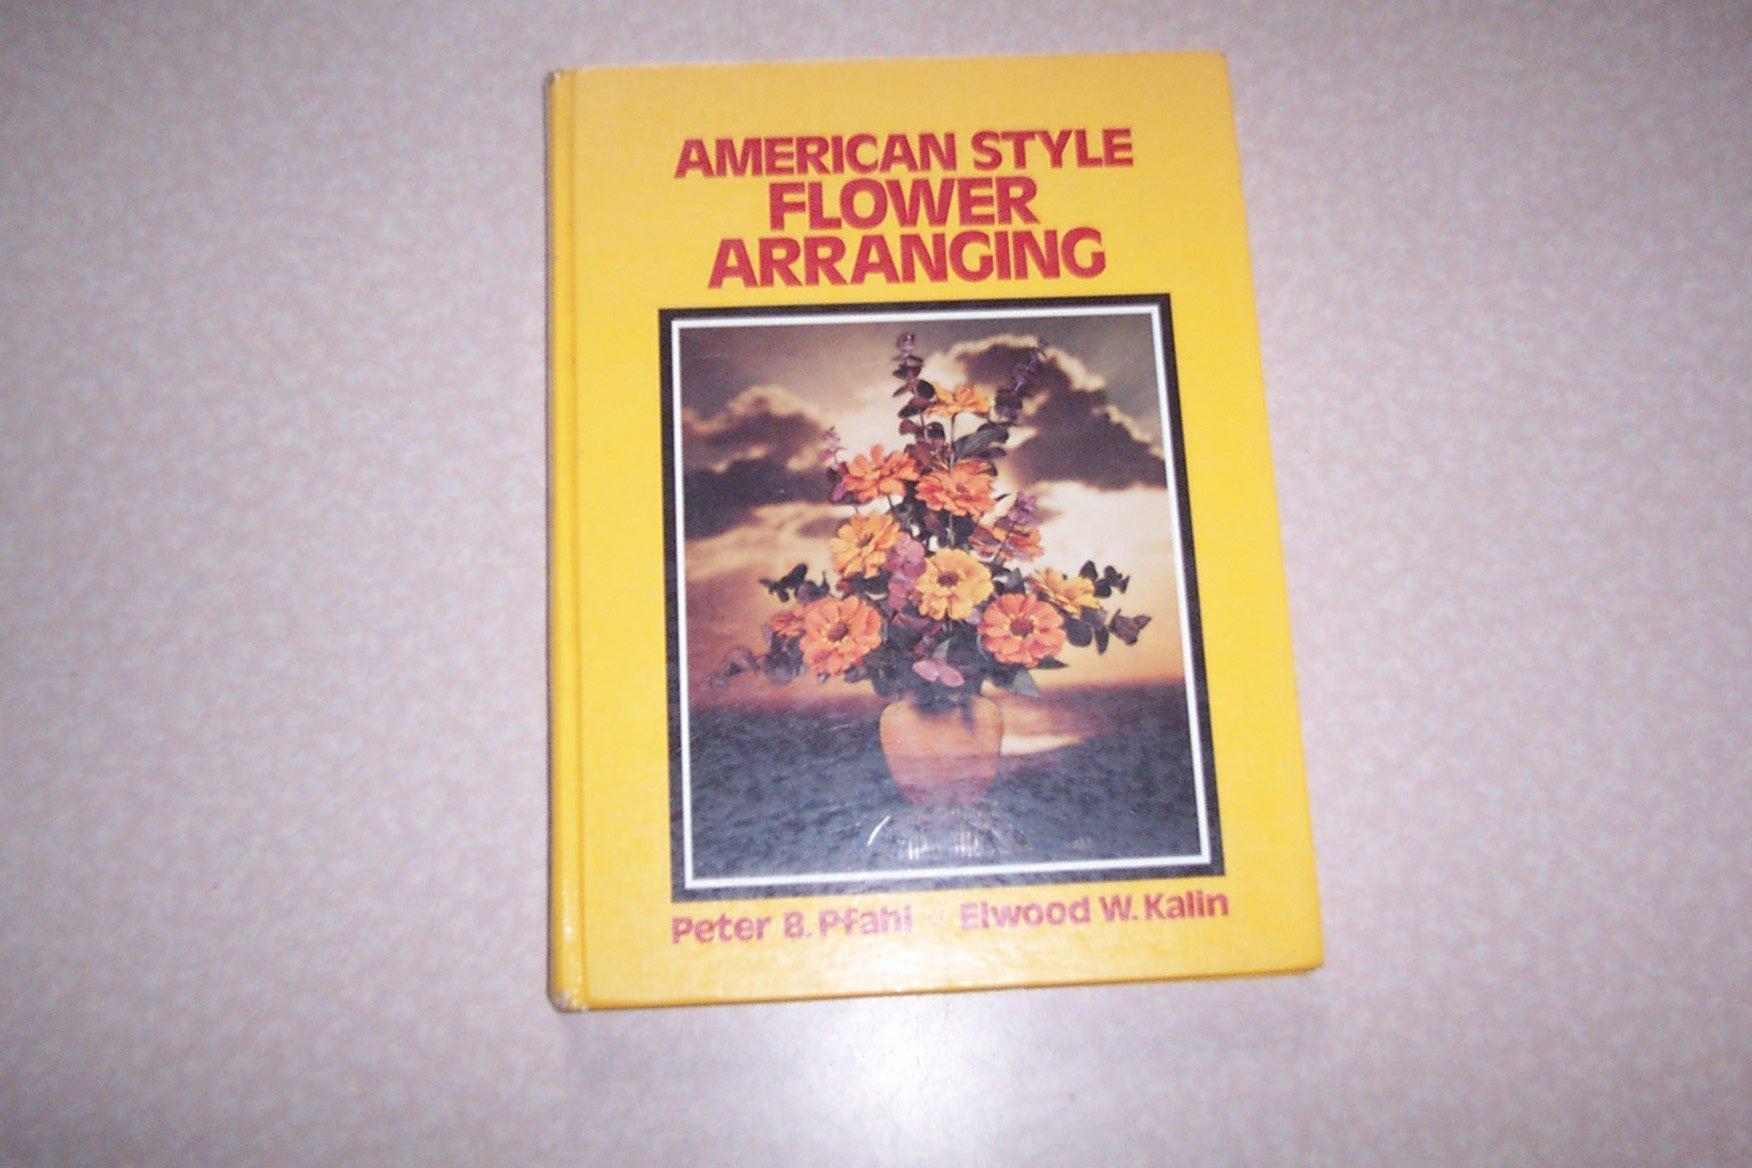 American Style Flower Arranging